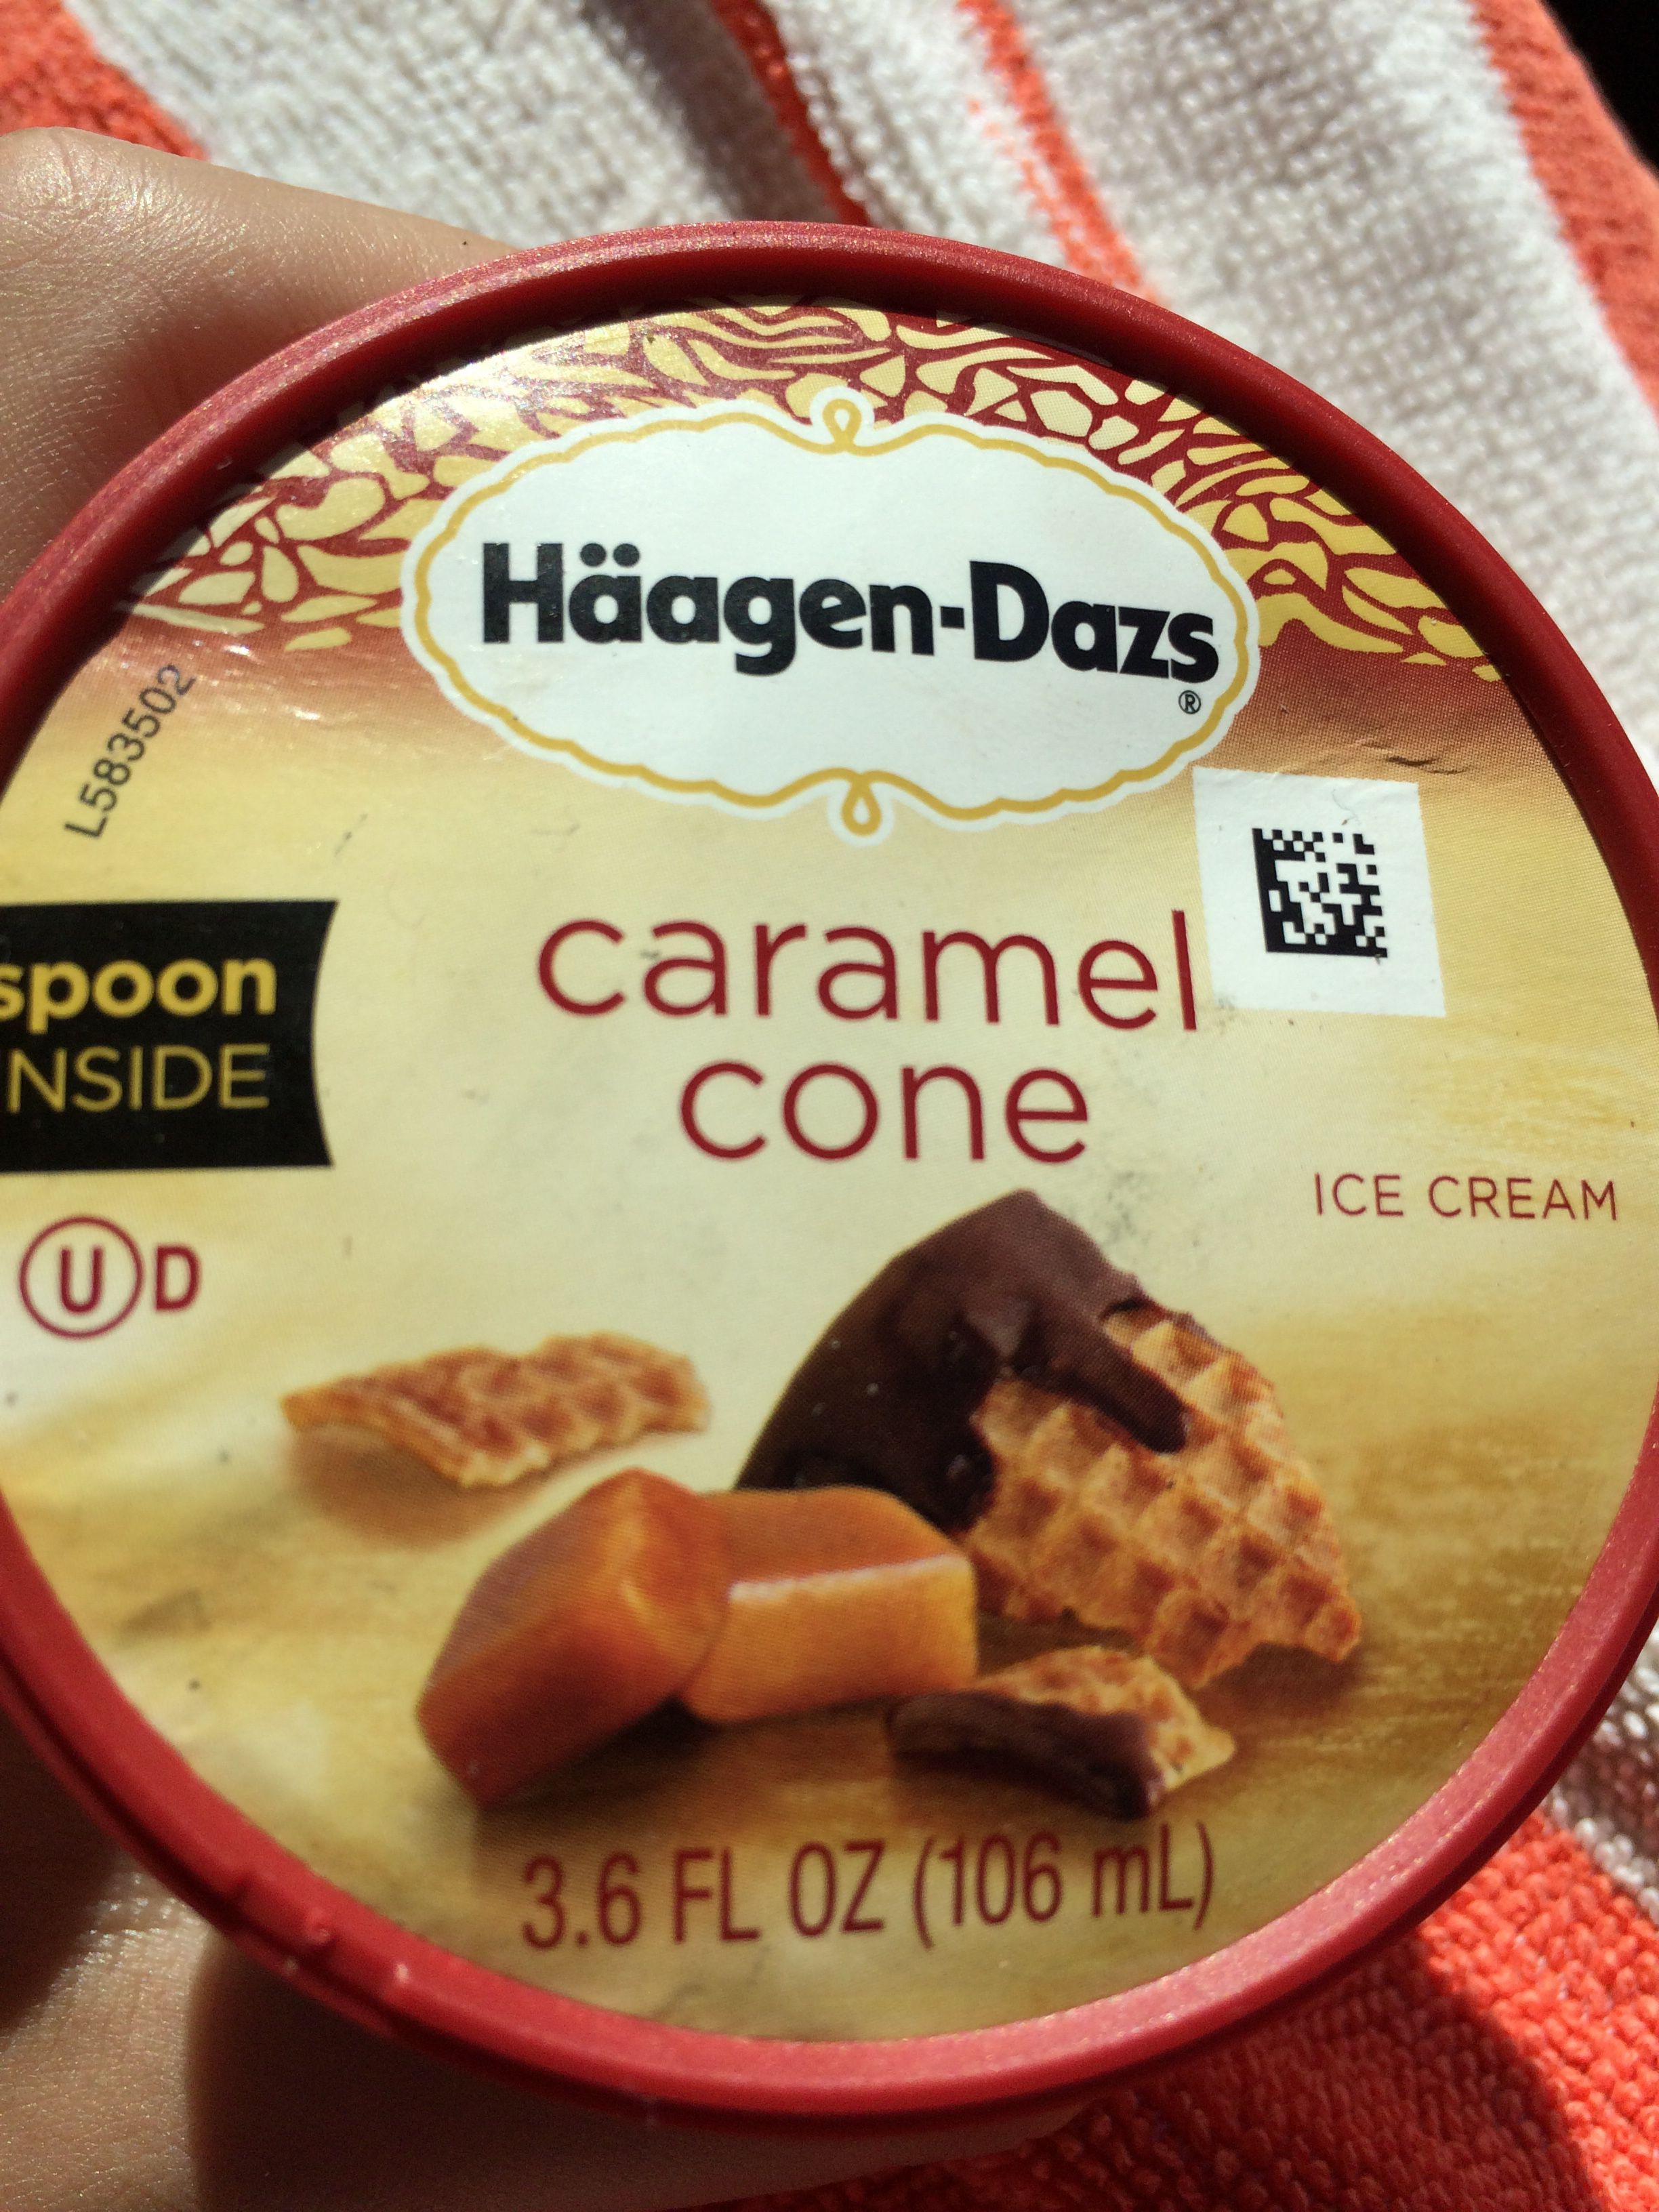 Carmel cone ice cream frozen yogurt ice cream flavors